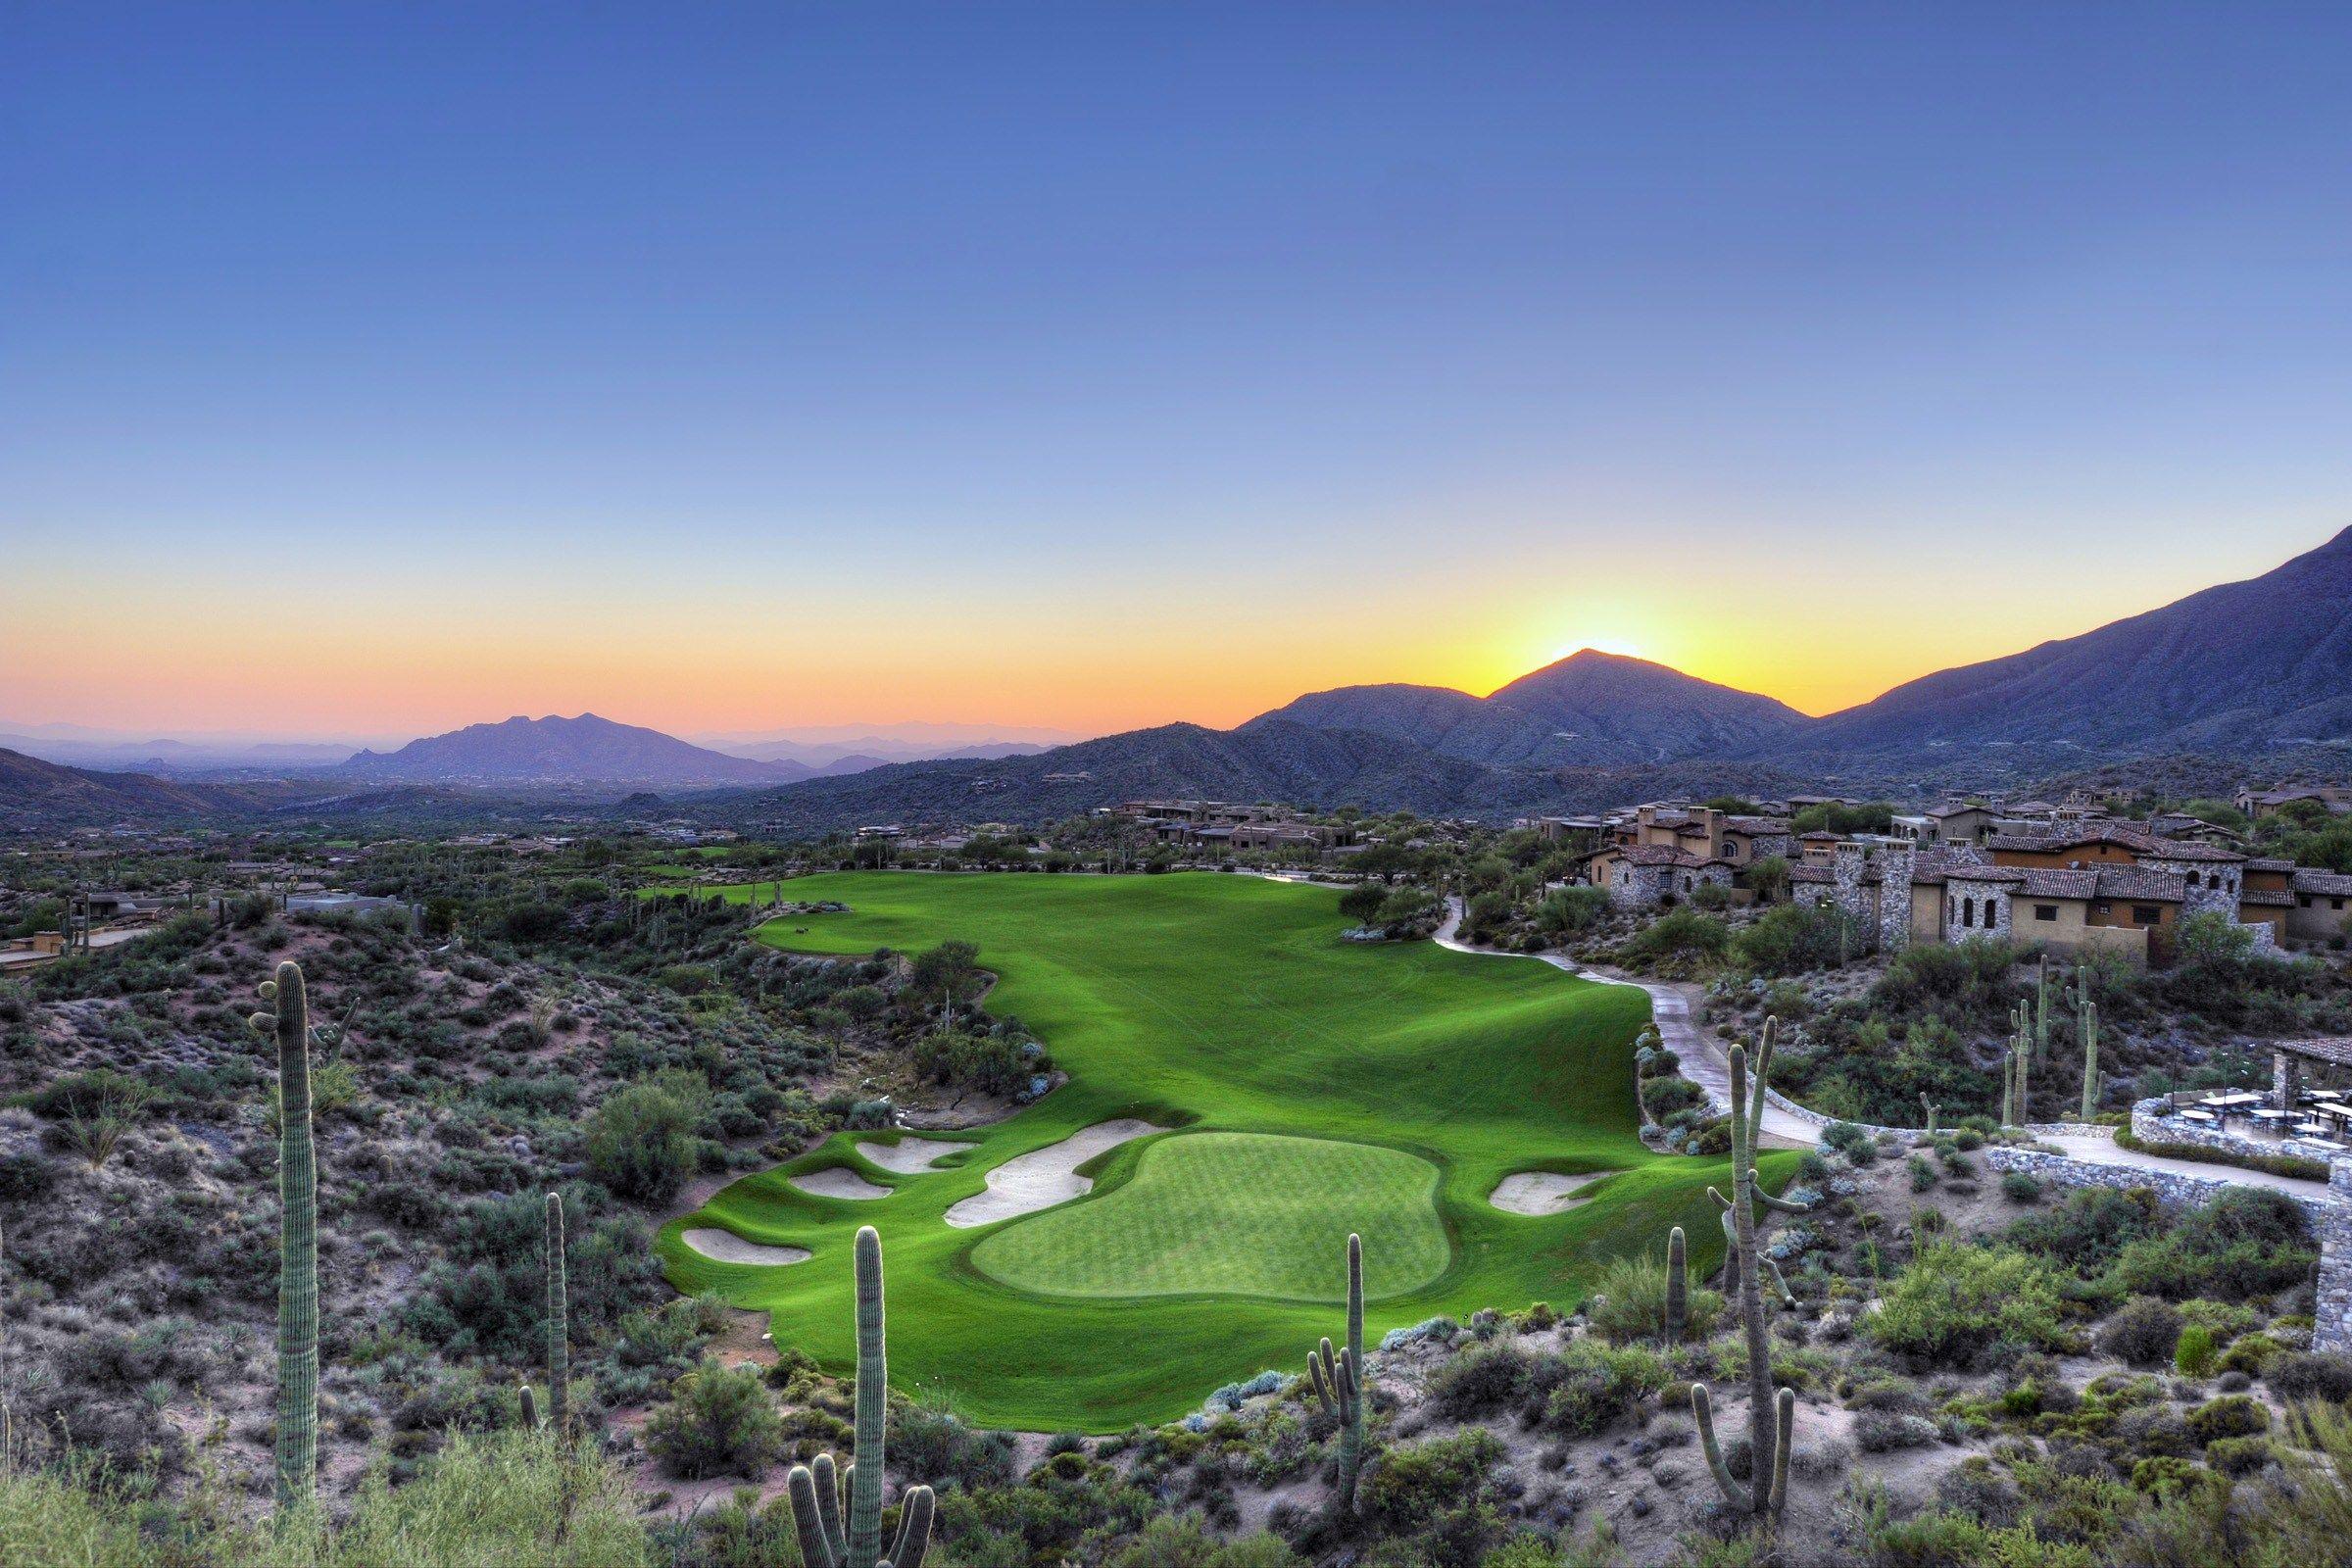 Desert Mountain Golf Club - Chiricahua course, Scottsdale AZ